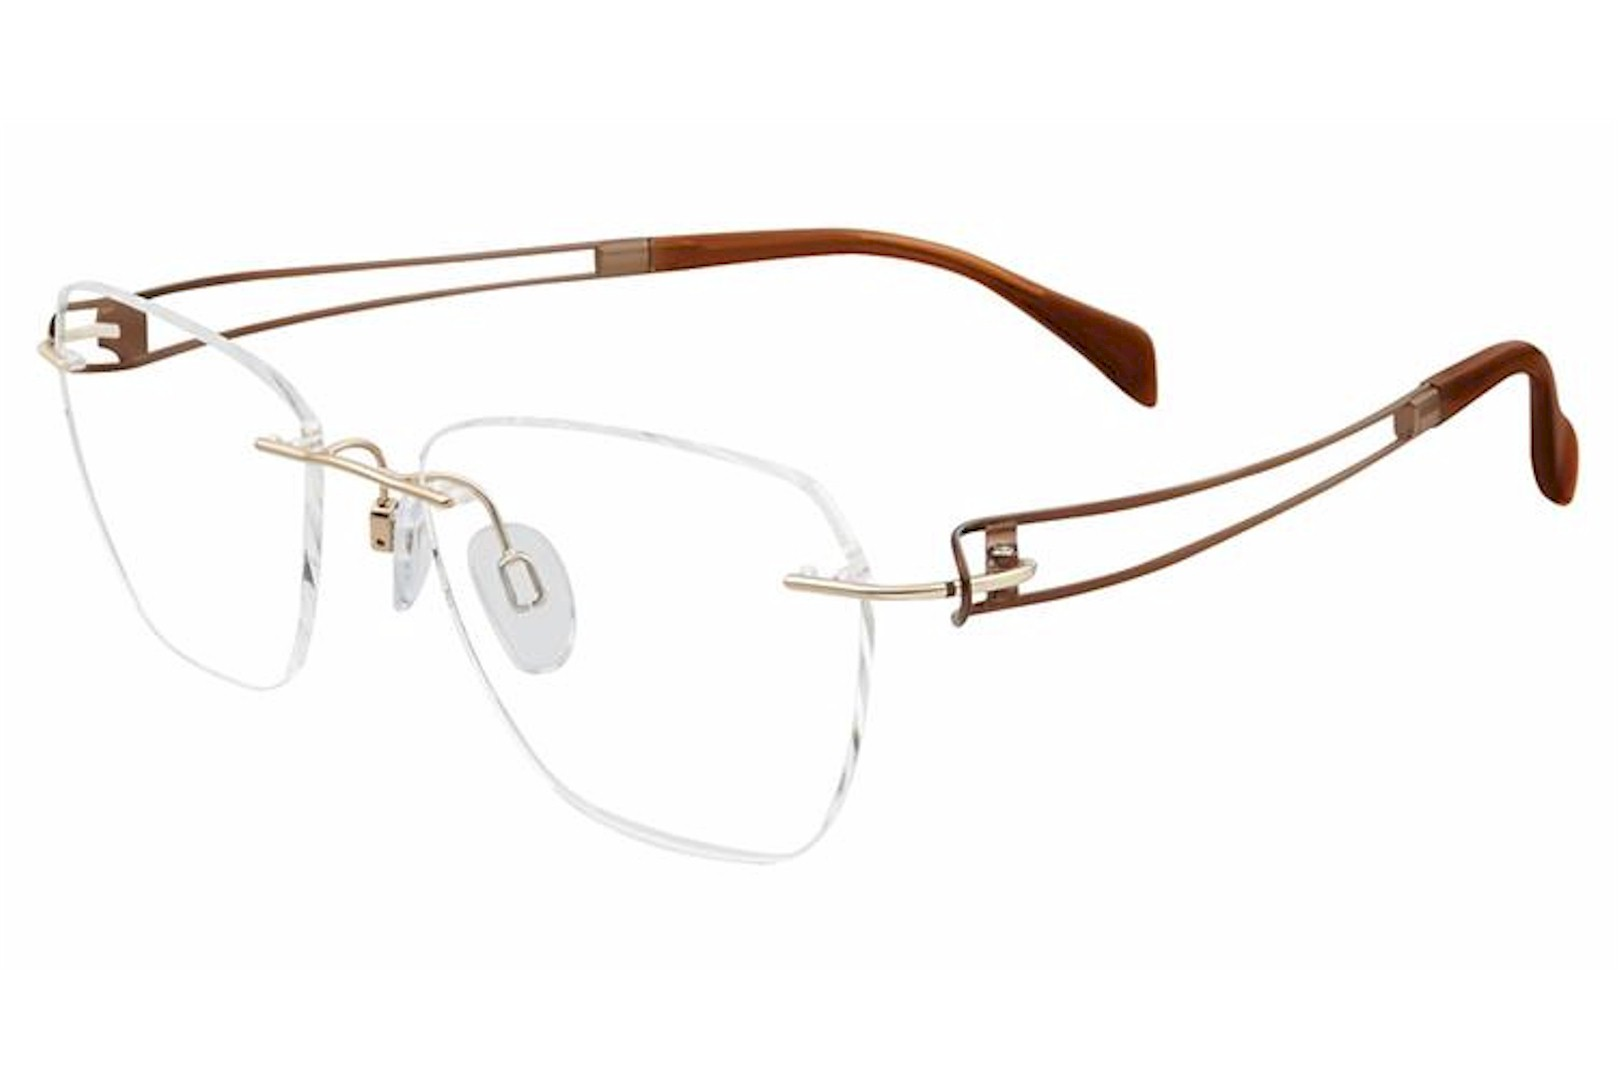 Charmant Eyeglass Frames Titanium Line Art XL 2116 GD Gold | eBay